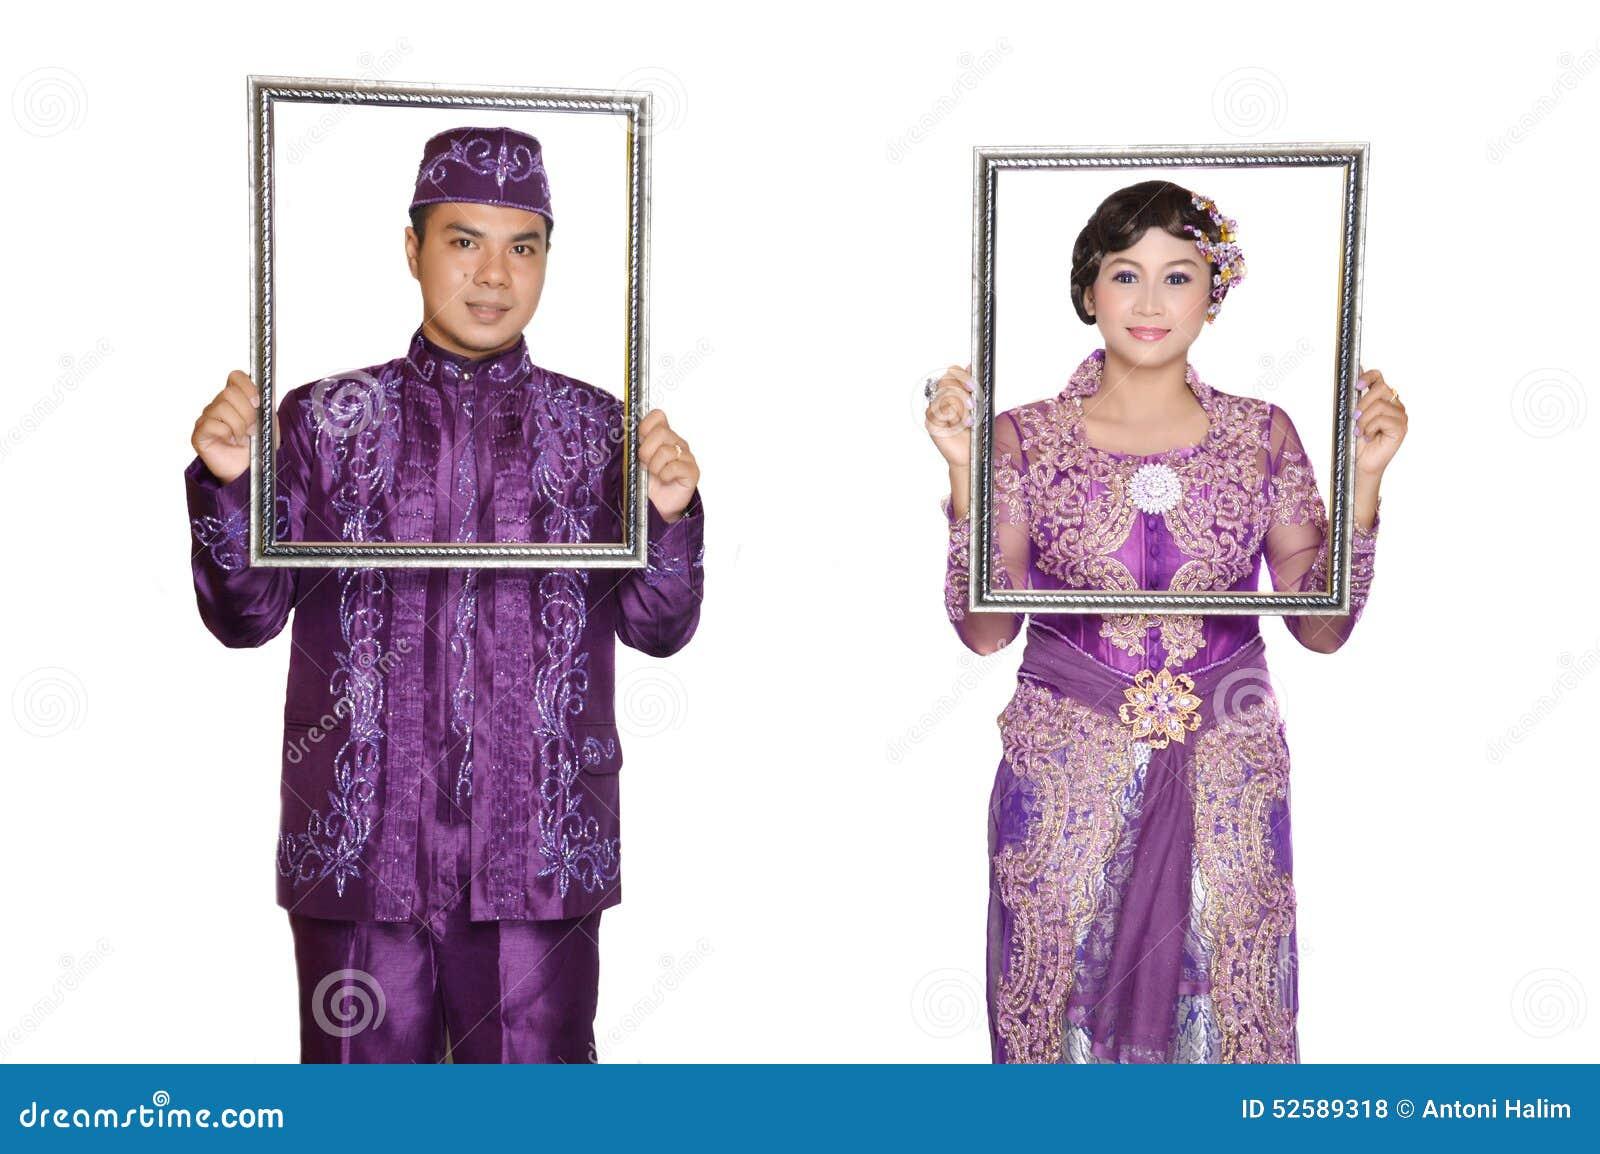 filipina com dating